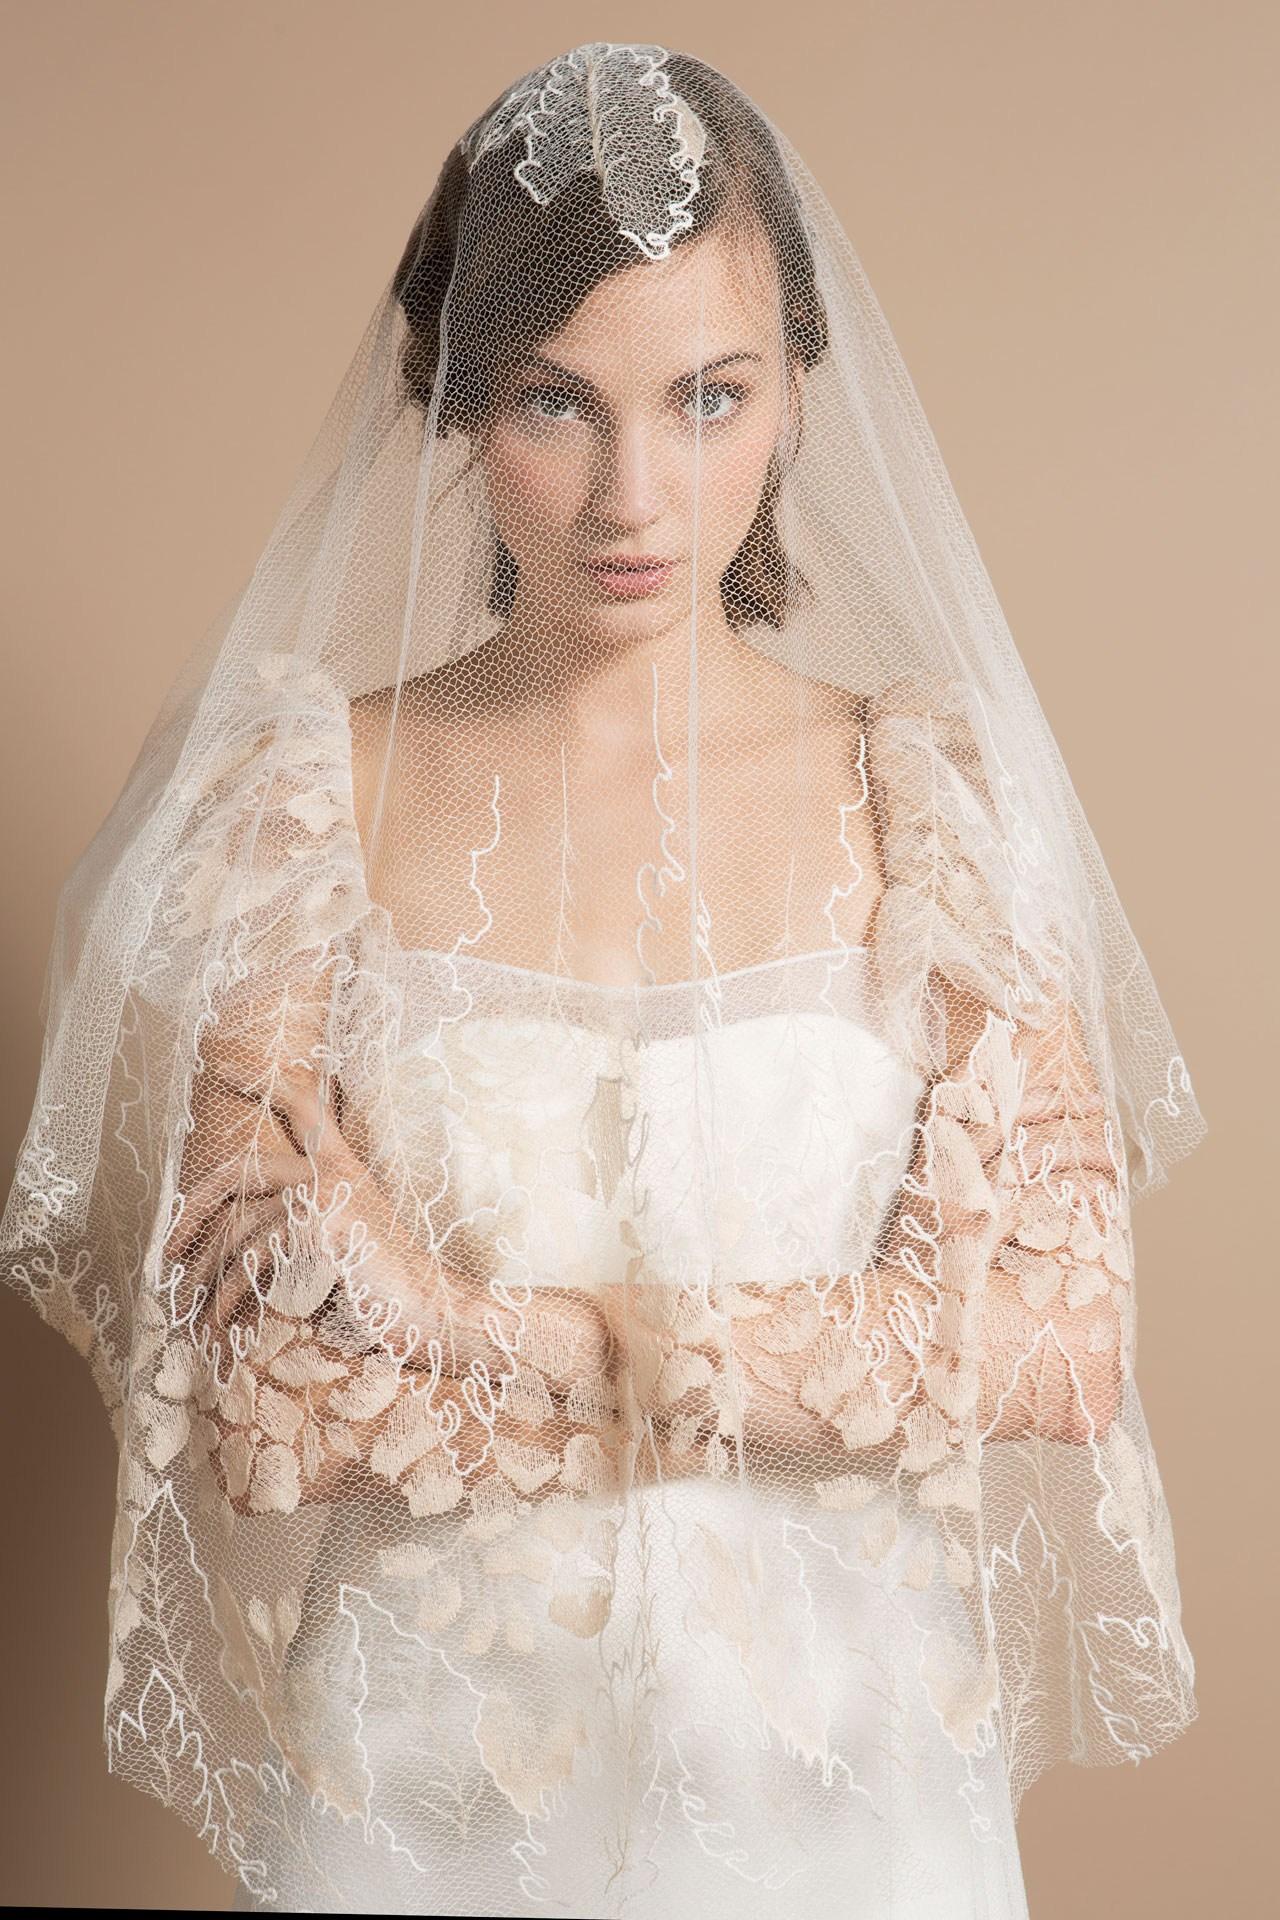 kq9b1694-delphine-manivet-2014-collection-brides-30oct13-pr_b-2.jpg